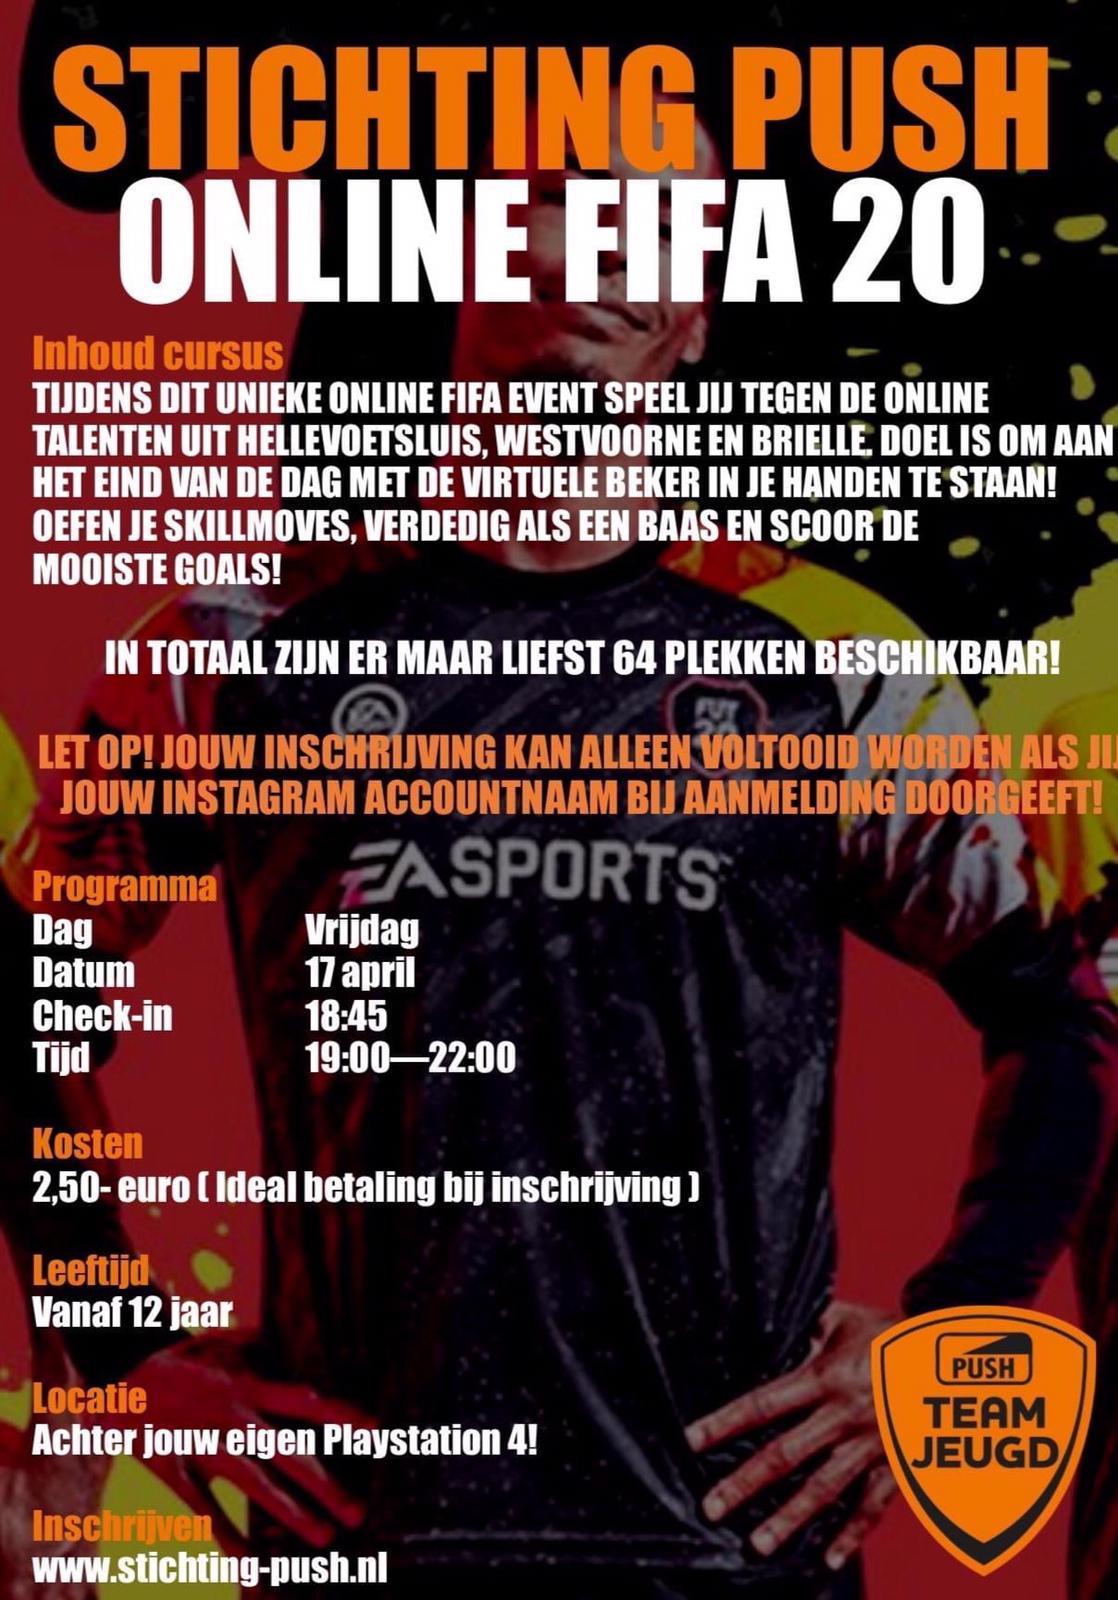 Stichting Push organiseert online FIFA 20 toernooi